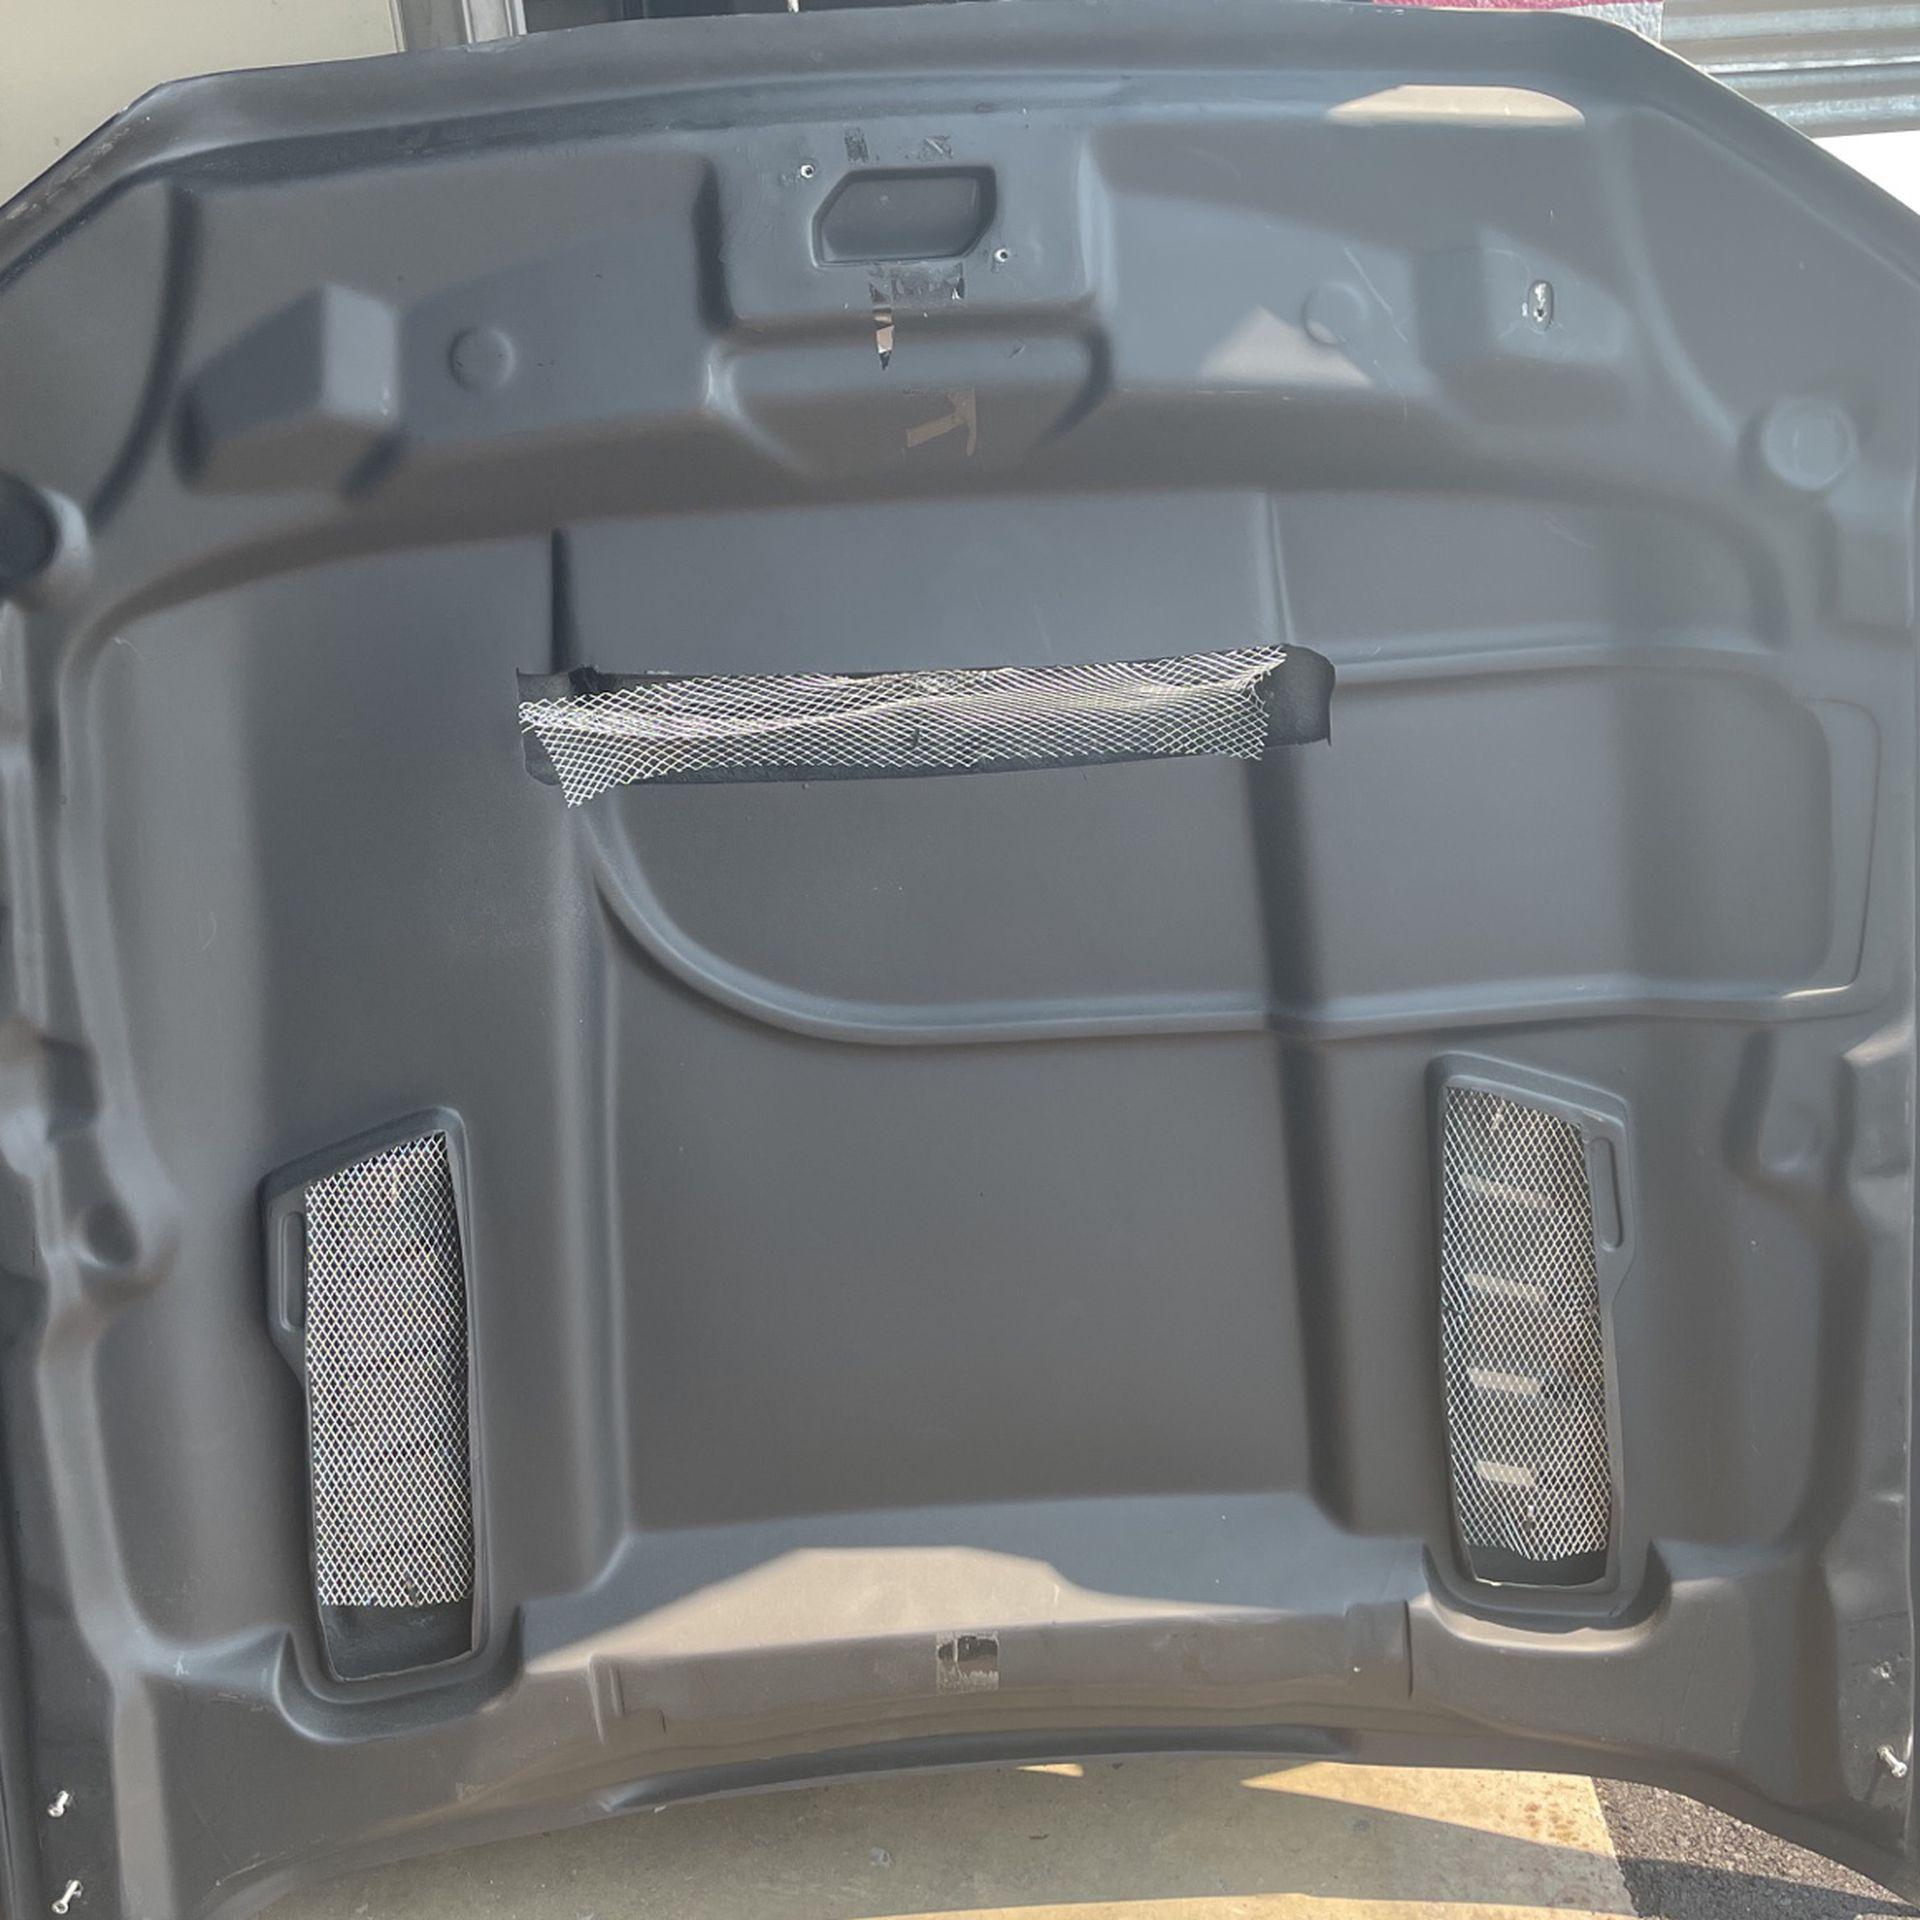 2012 Mustang Hood Plastic With Added Hood Scoop